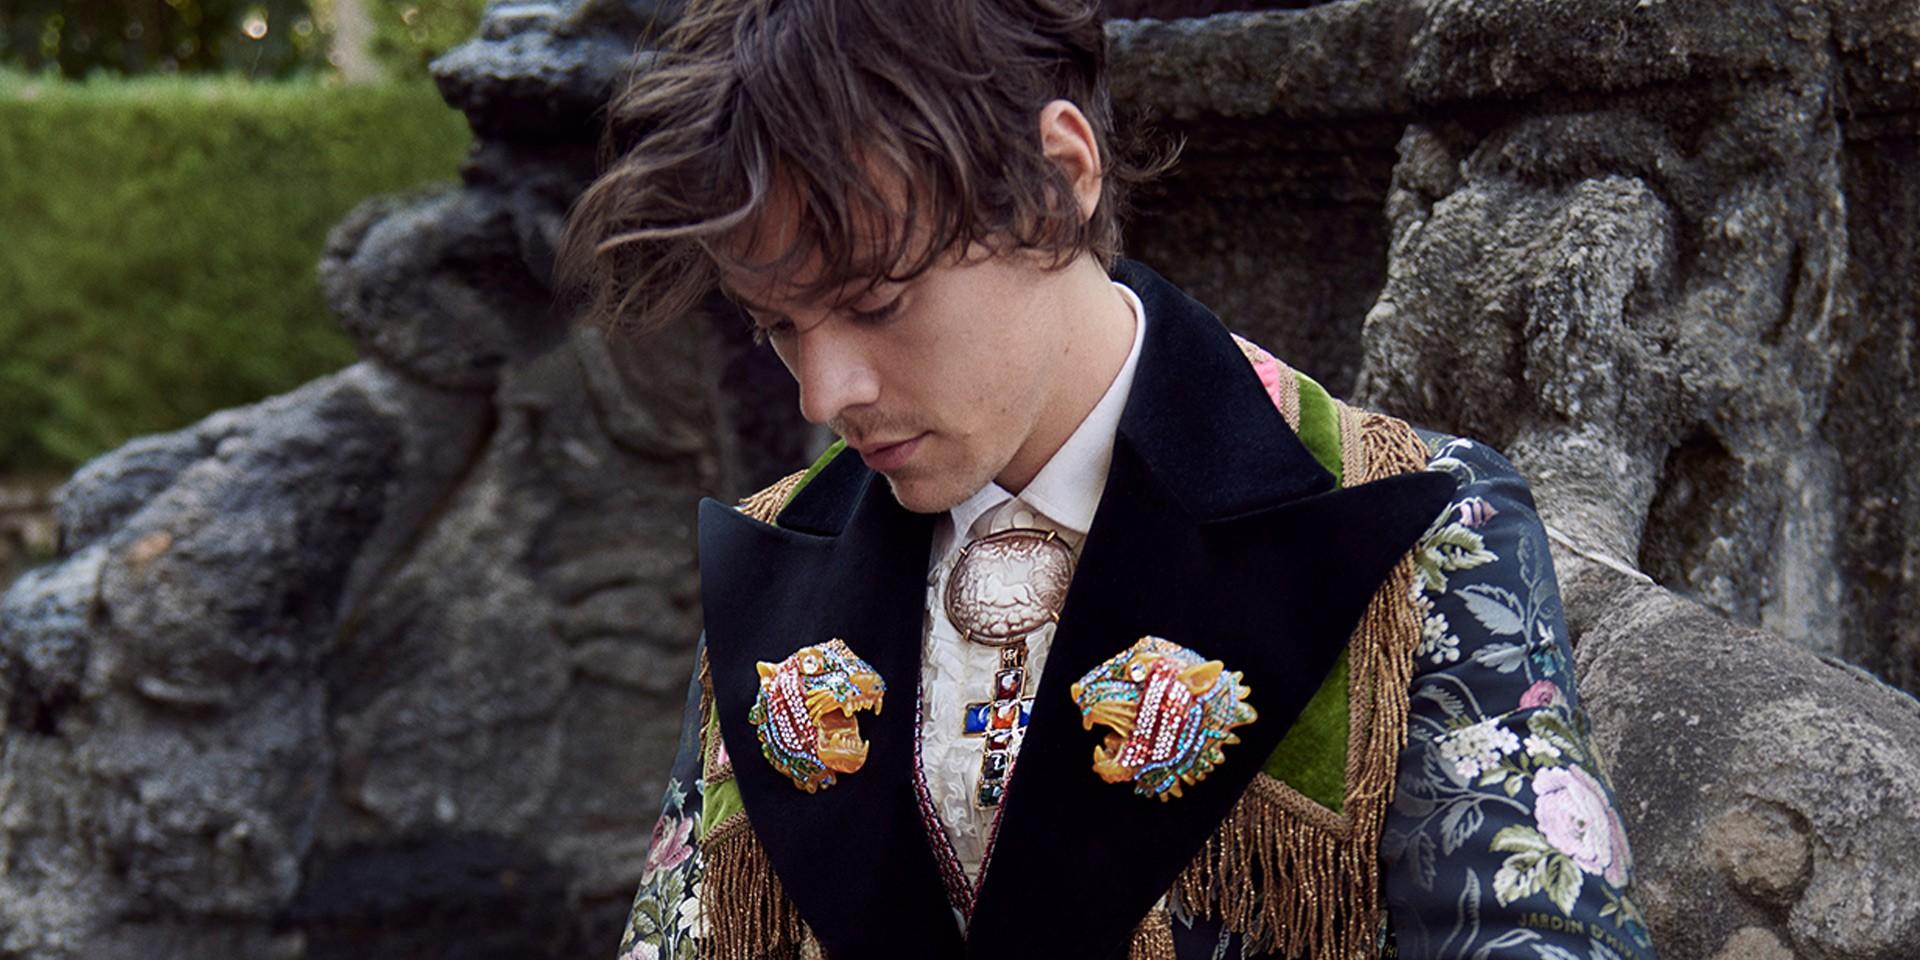 Harry Styles's second studio album Fine Line is finally here – listen